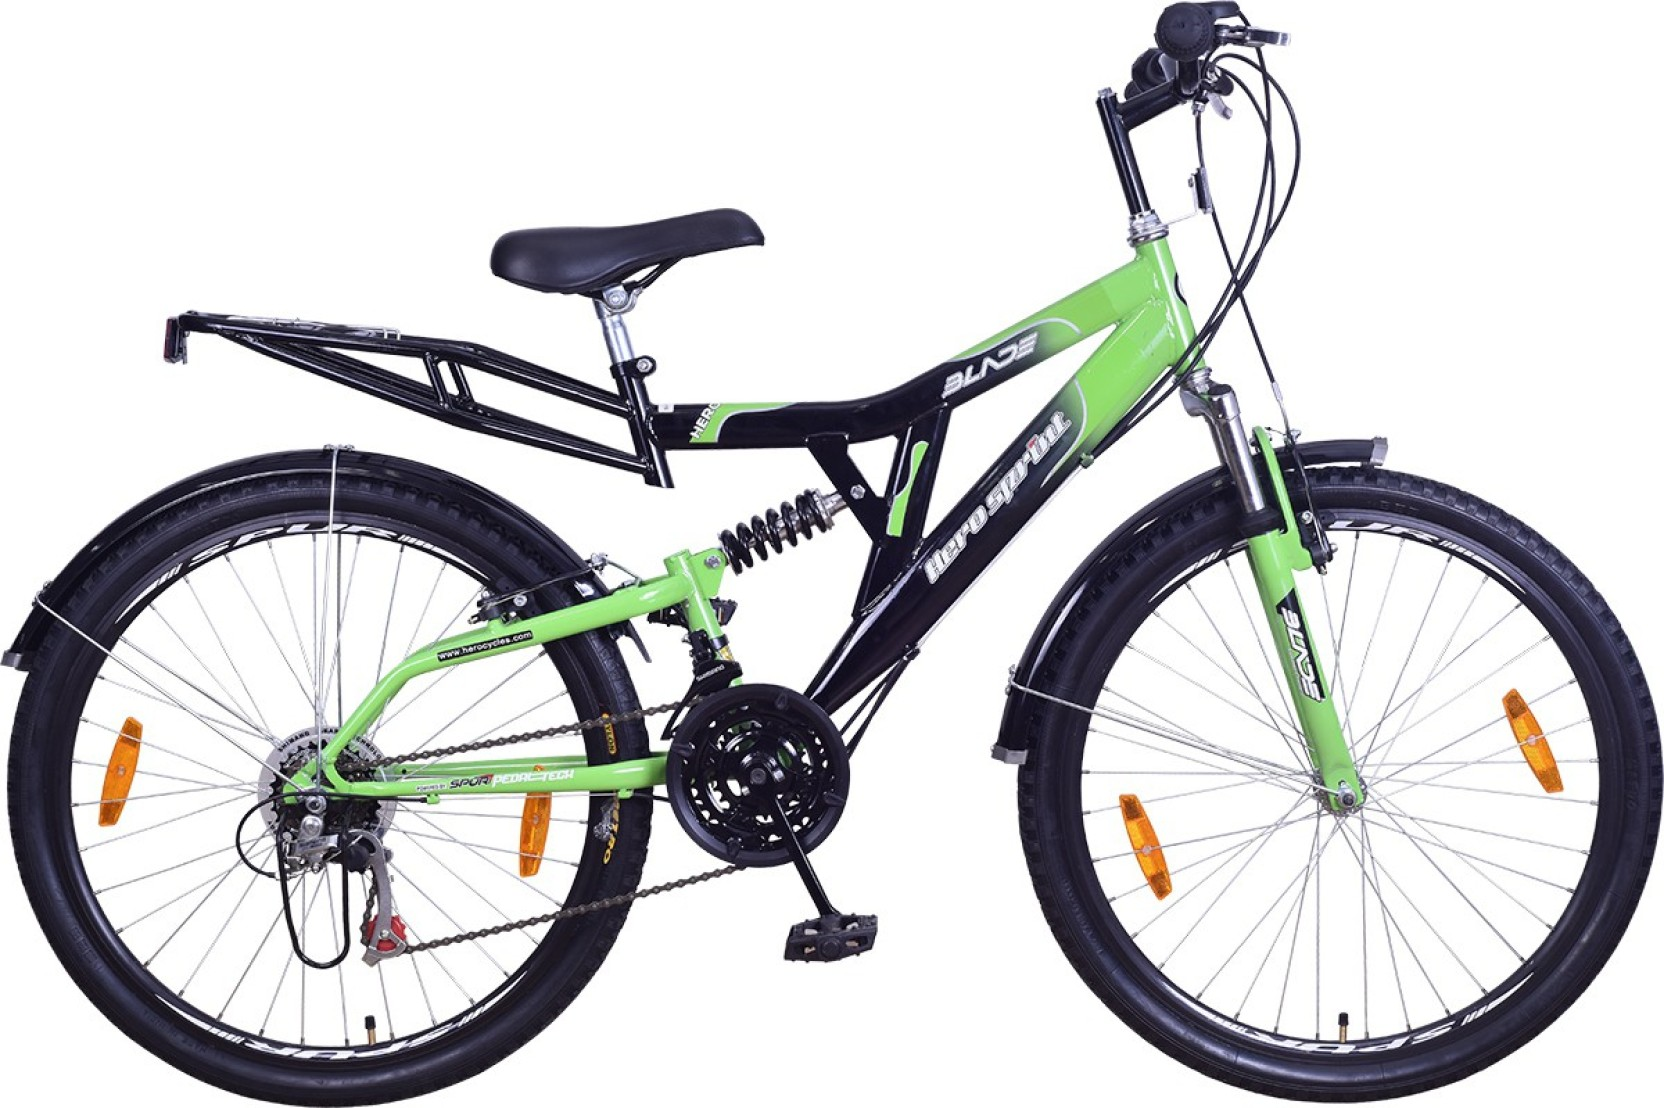 Hero Blade 26T S365BBDBD02 Hybrid Cycle (Green, Black)